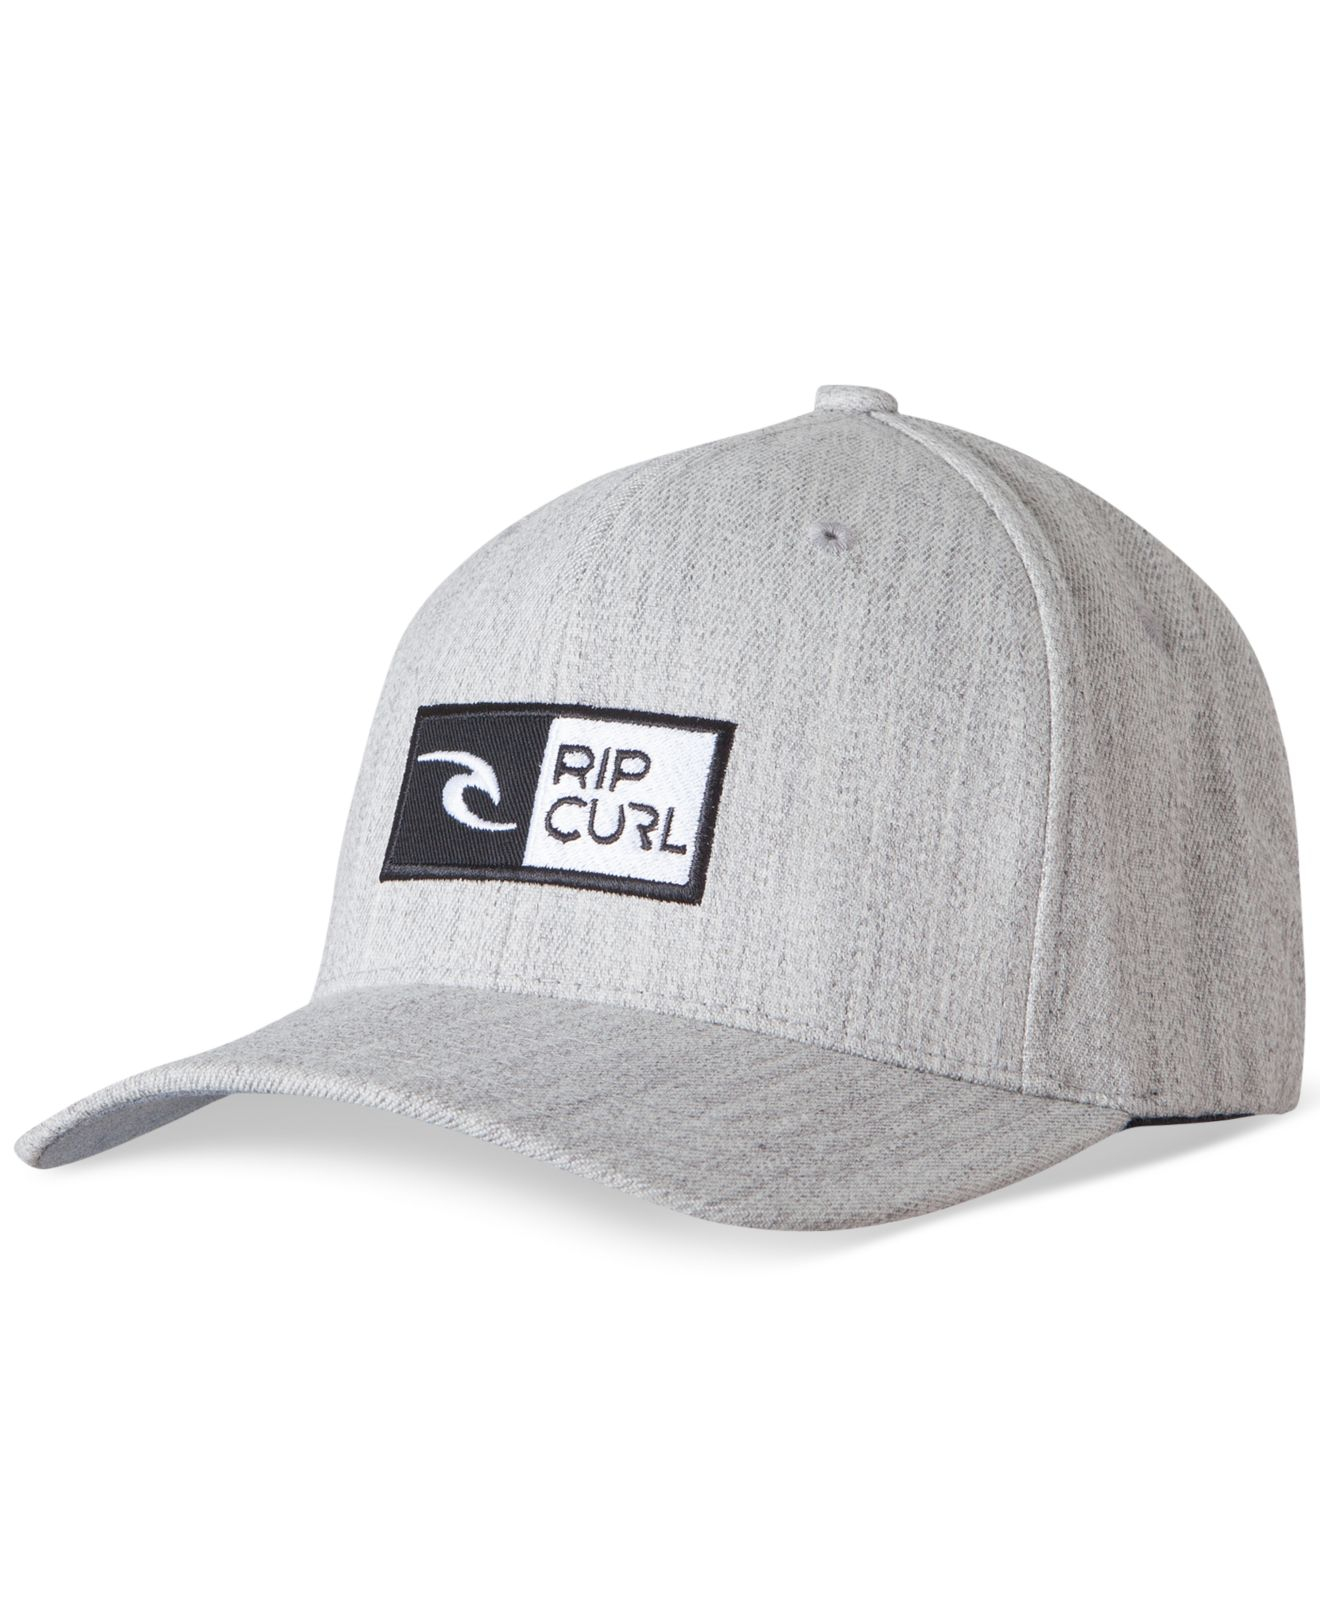 Lyst - Rip Curl Ripawatu Flex-fit Cap in Gray for Men 08a6b805eaa